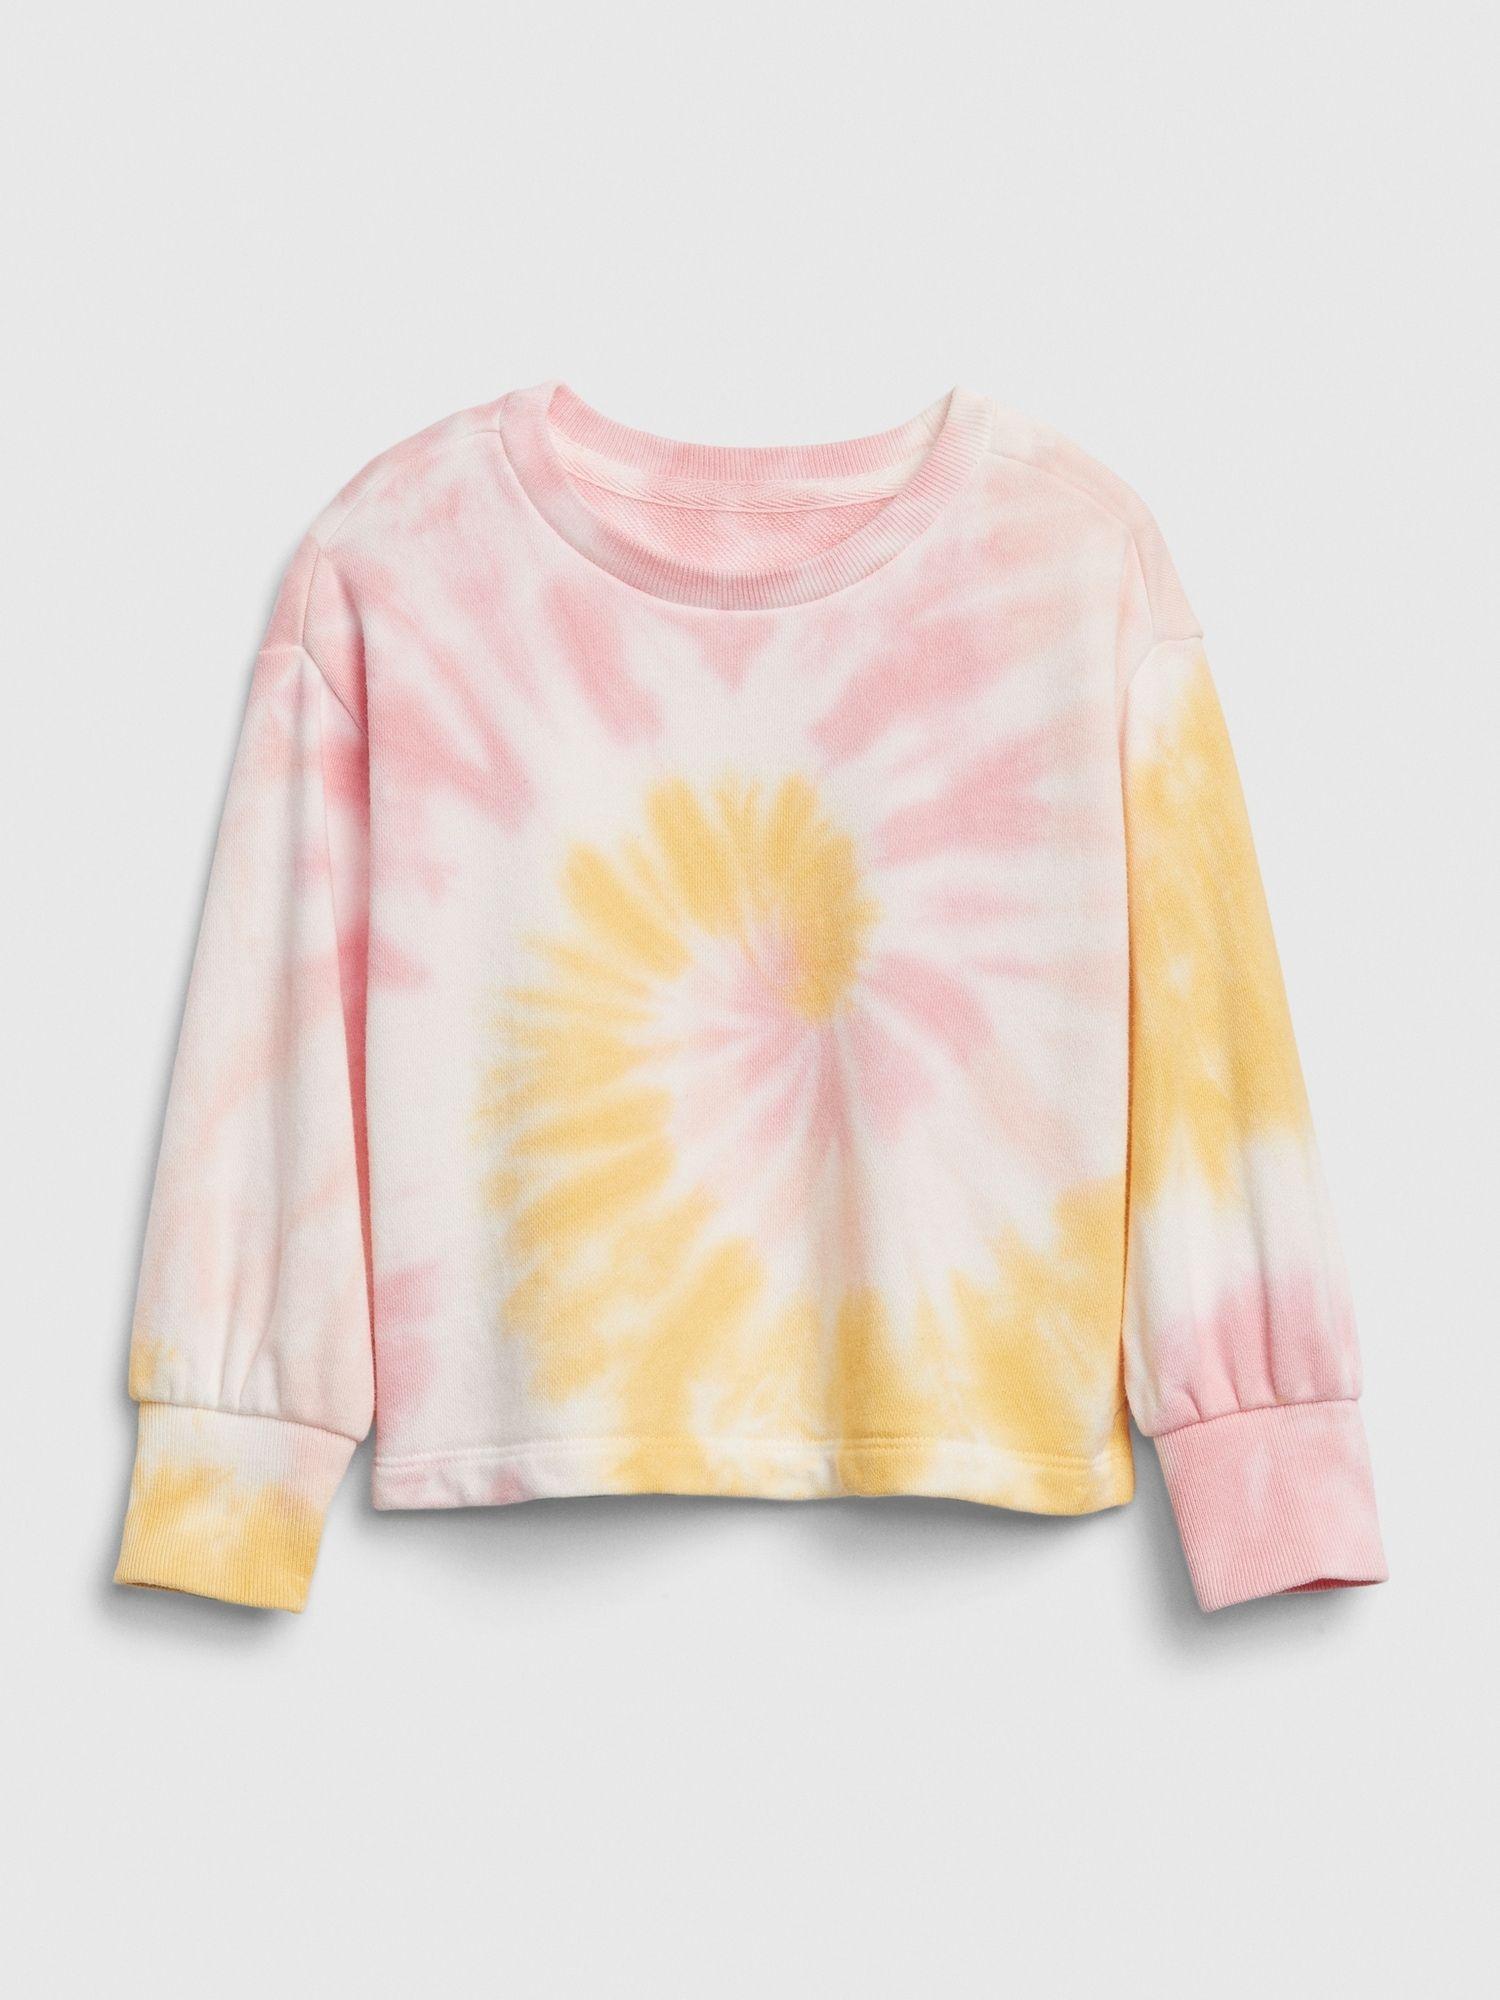 Toddler Tie Dye Sweatshirt In 2021 Toddler Ties Tie Dye Sweatshirt Sweatshirts [ 2000 x 1500 Pixel ]